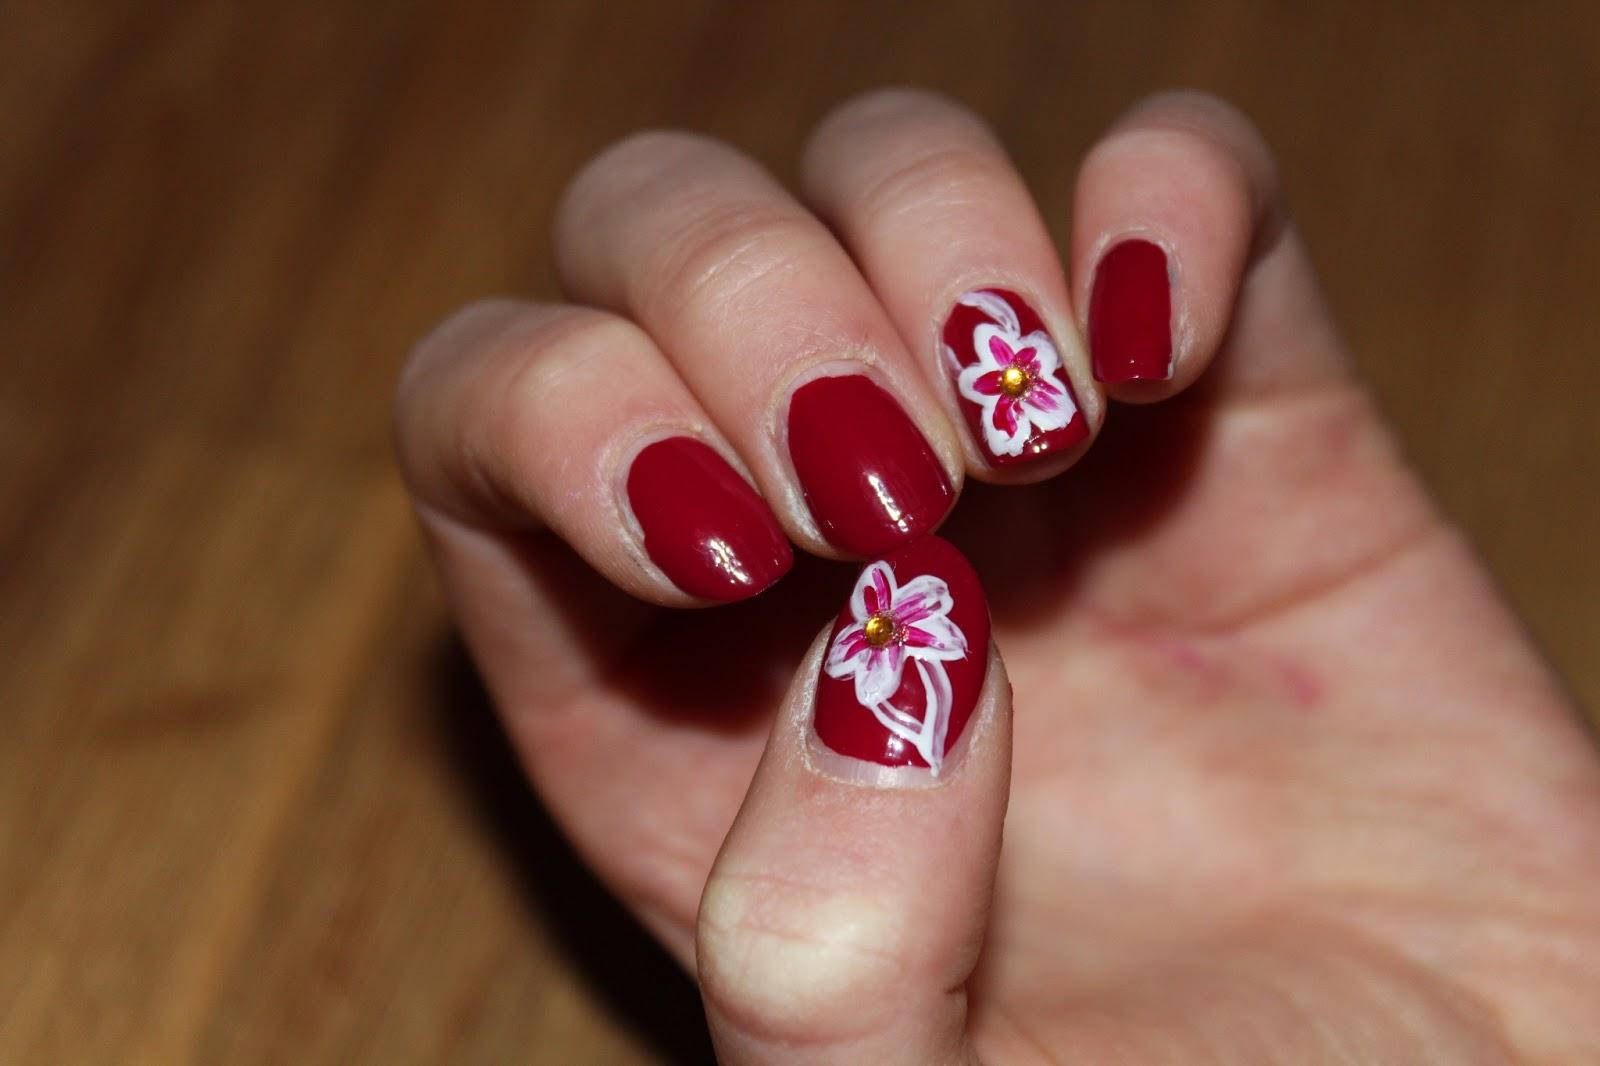 Cute and easy nail designs - Cute nail polish designs to do at home ...